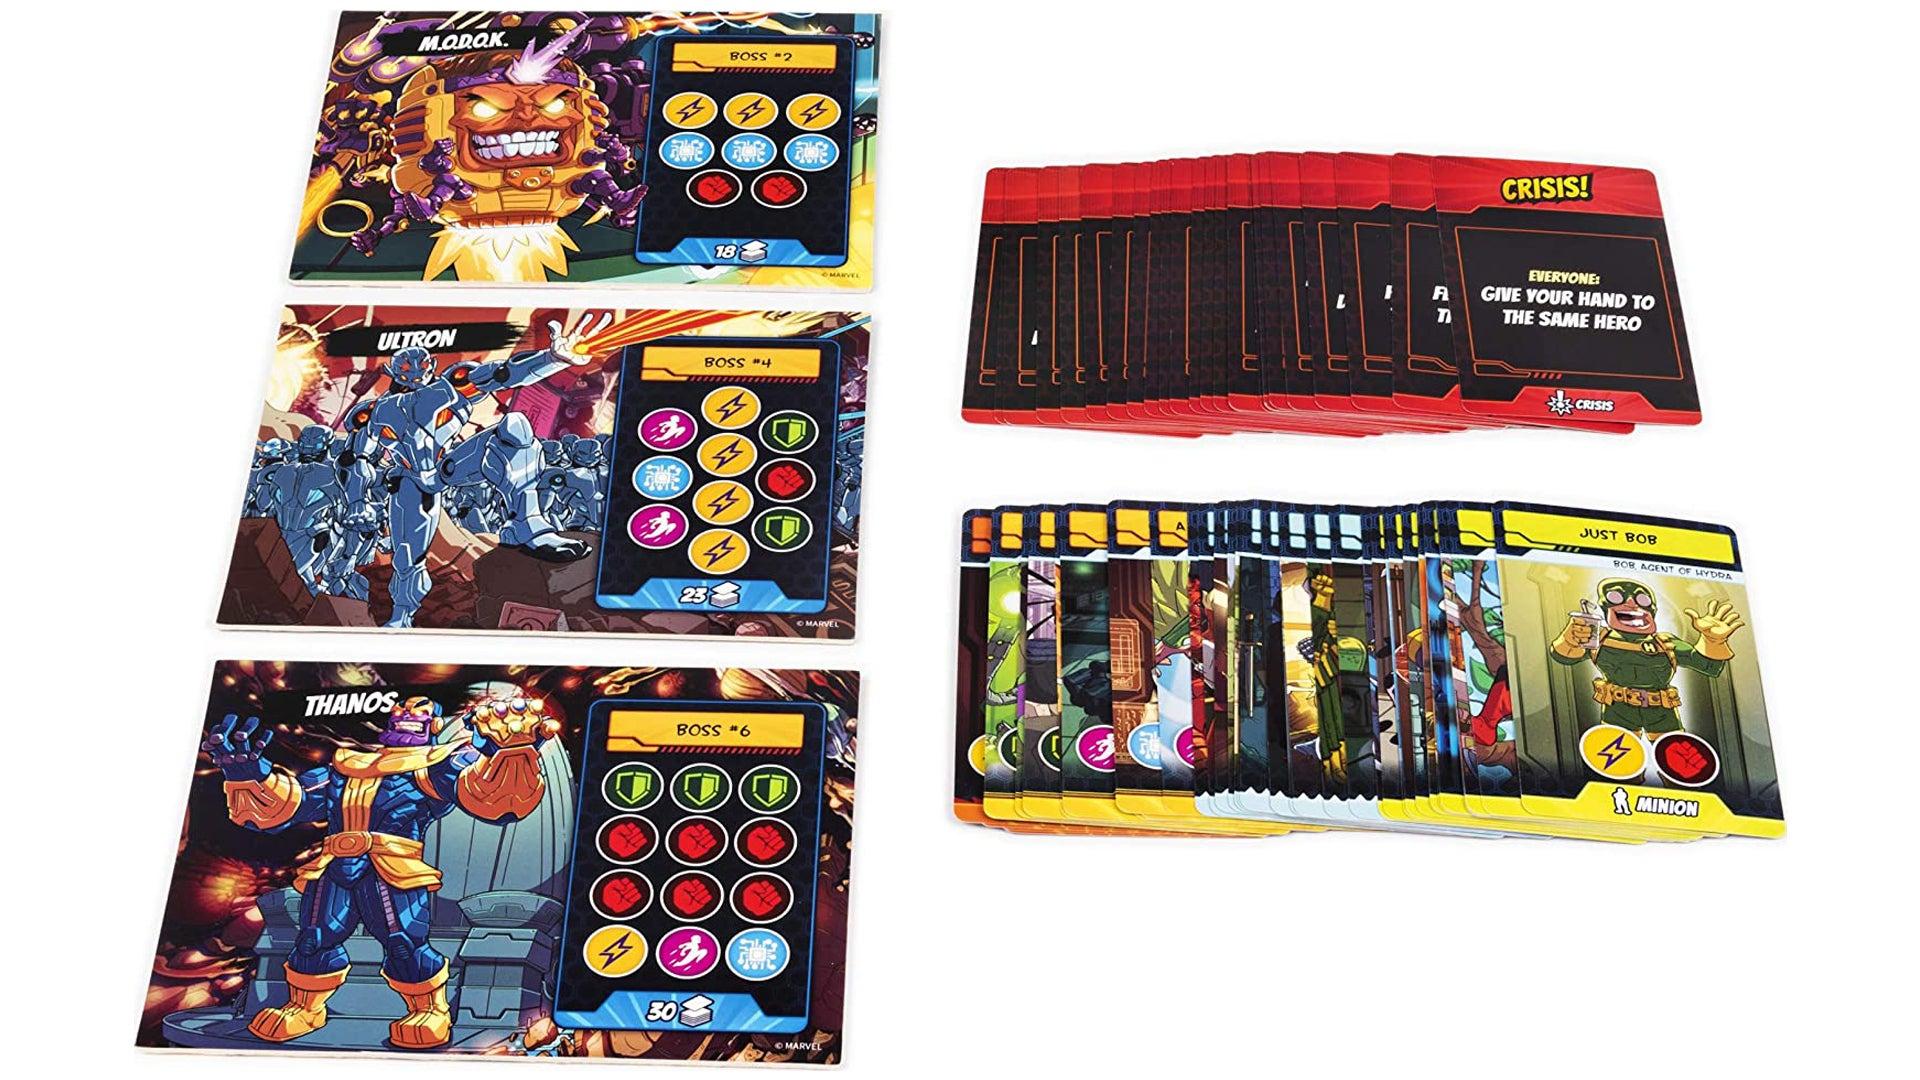 5 Minute Marvel cards